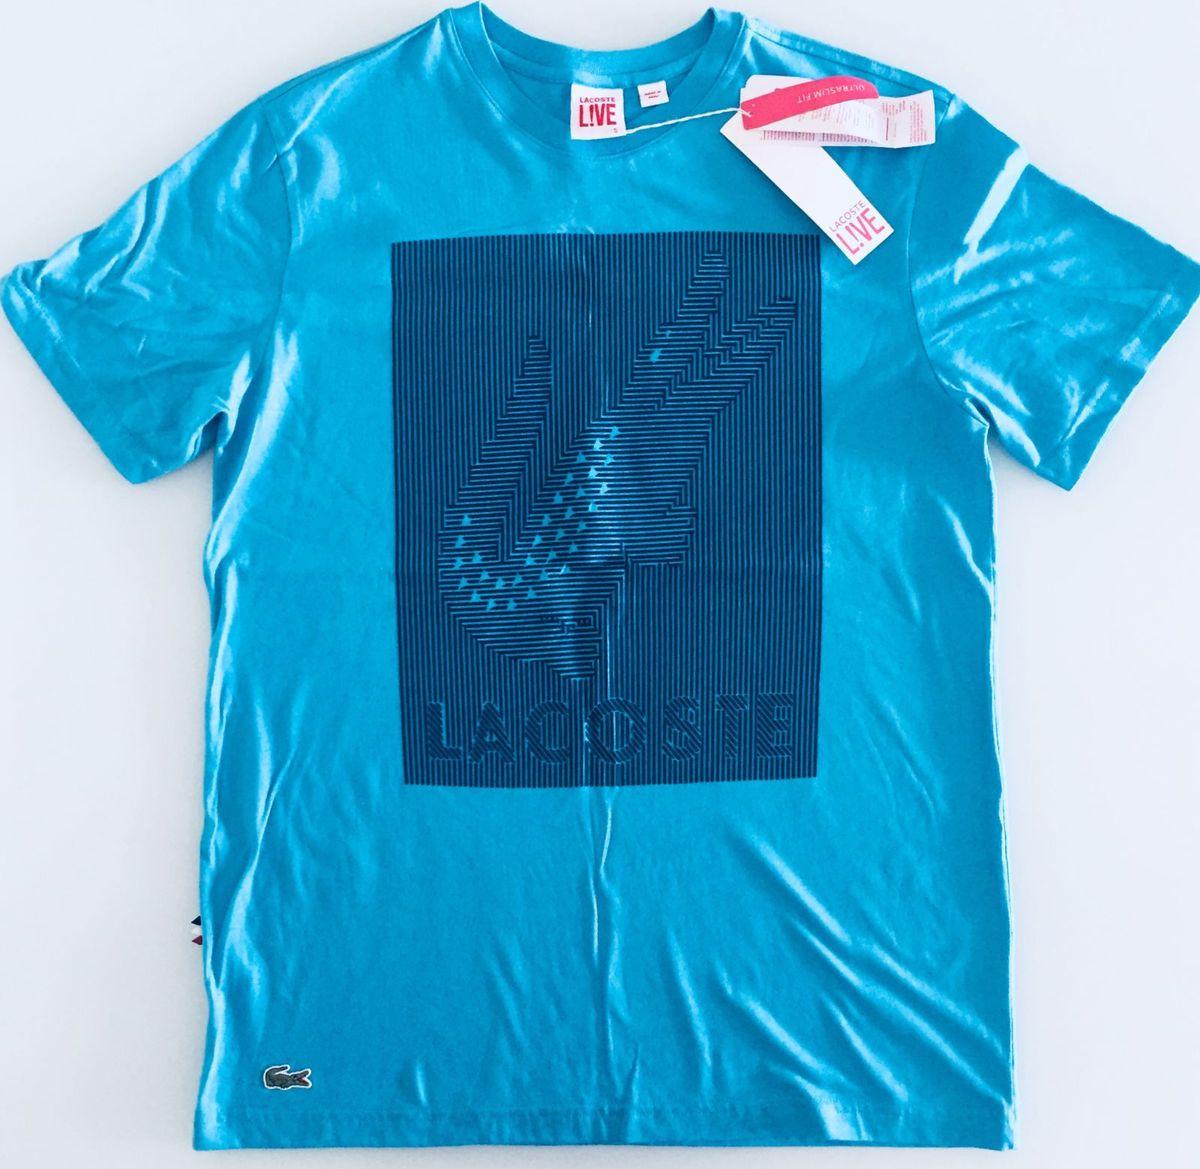 f287a89d221b7 camisa lacoste original masculina azul jacaré tam m - camisas lacoste